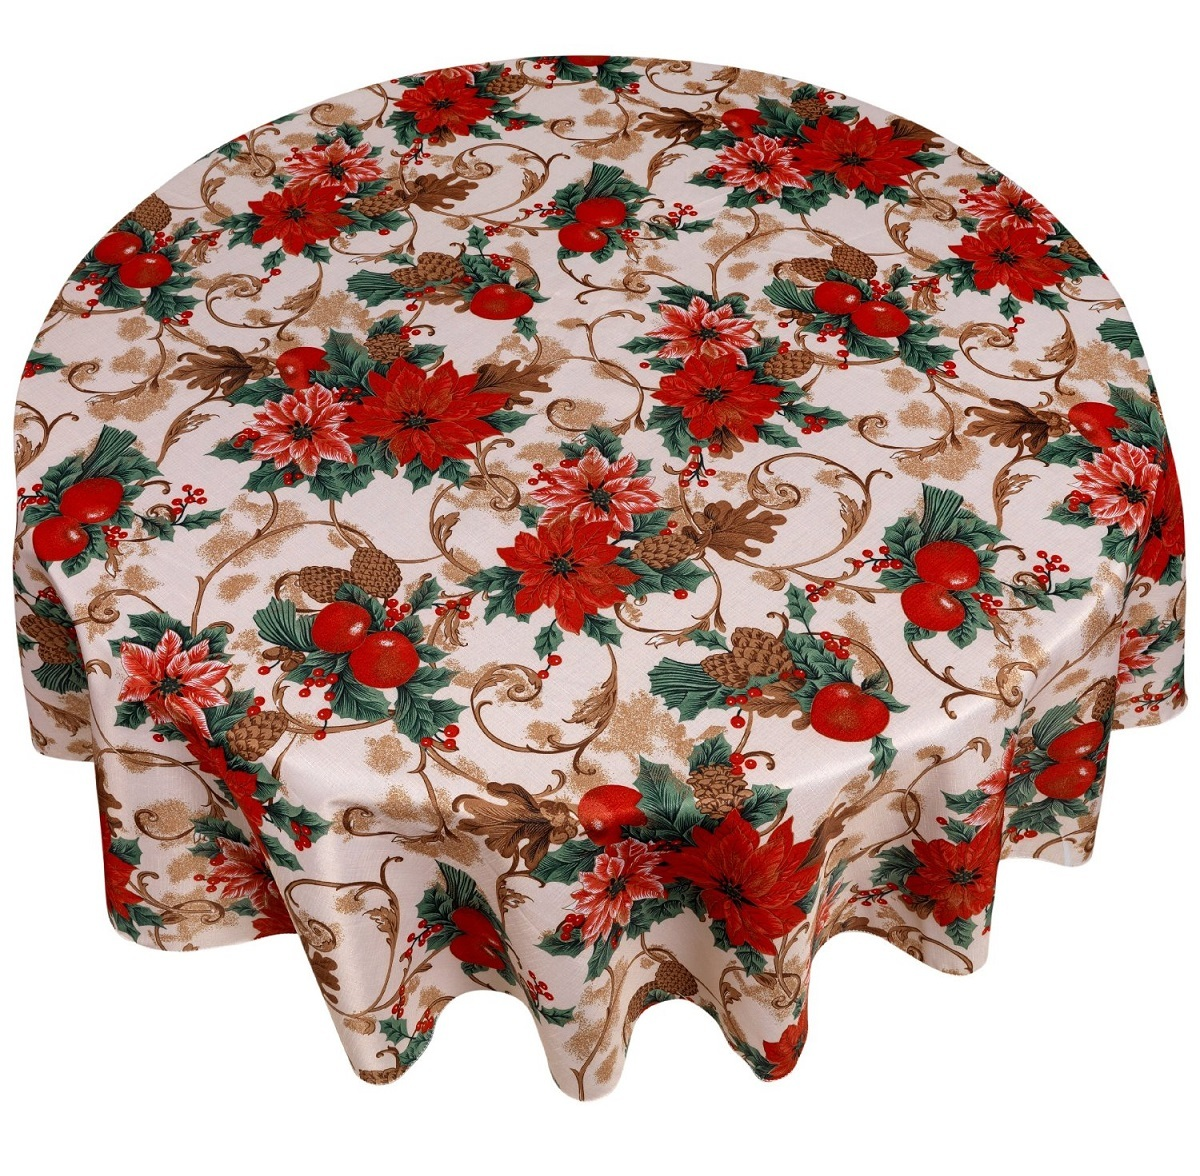 Кухня Скатерть круглая 178 Carnation Home Fashions Christmas Fabric Tablecloths Christmas Floral skatert-carnation-christmas-fabric-tablecloths-christmas-floral-ssha-kitay.jpg